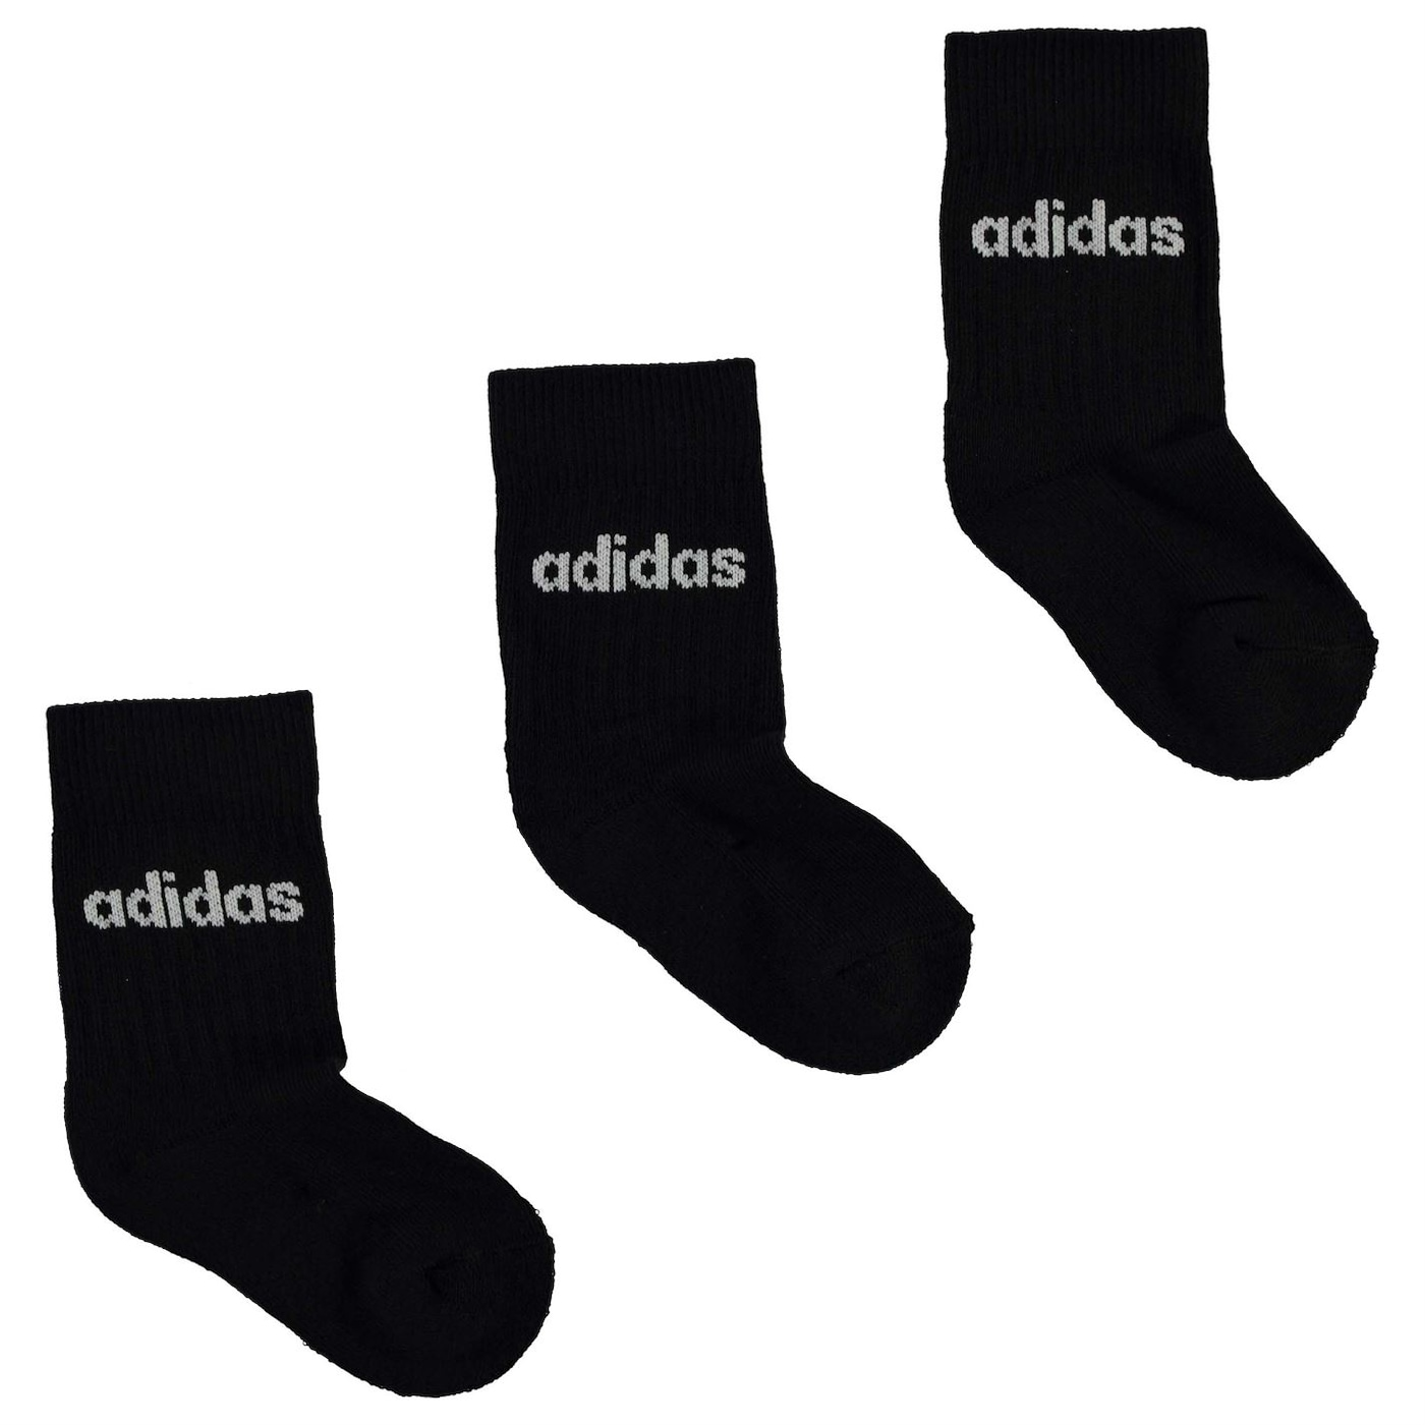 Adidas Crew Socks 3 Pack Infants